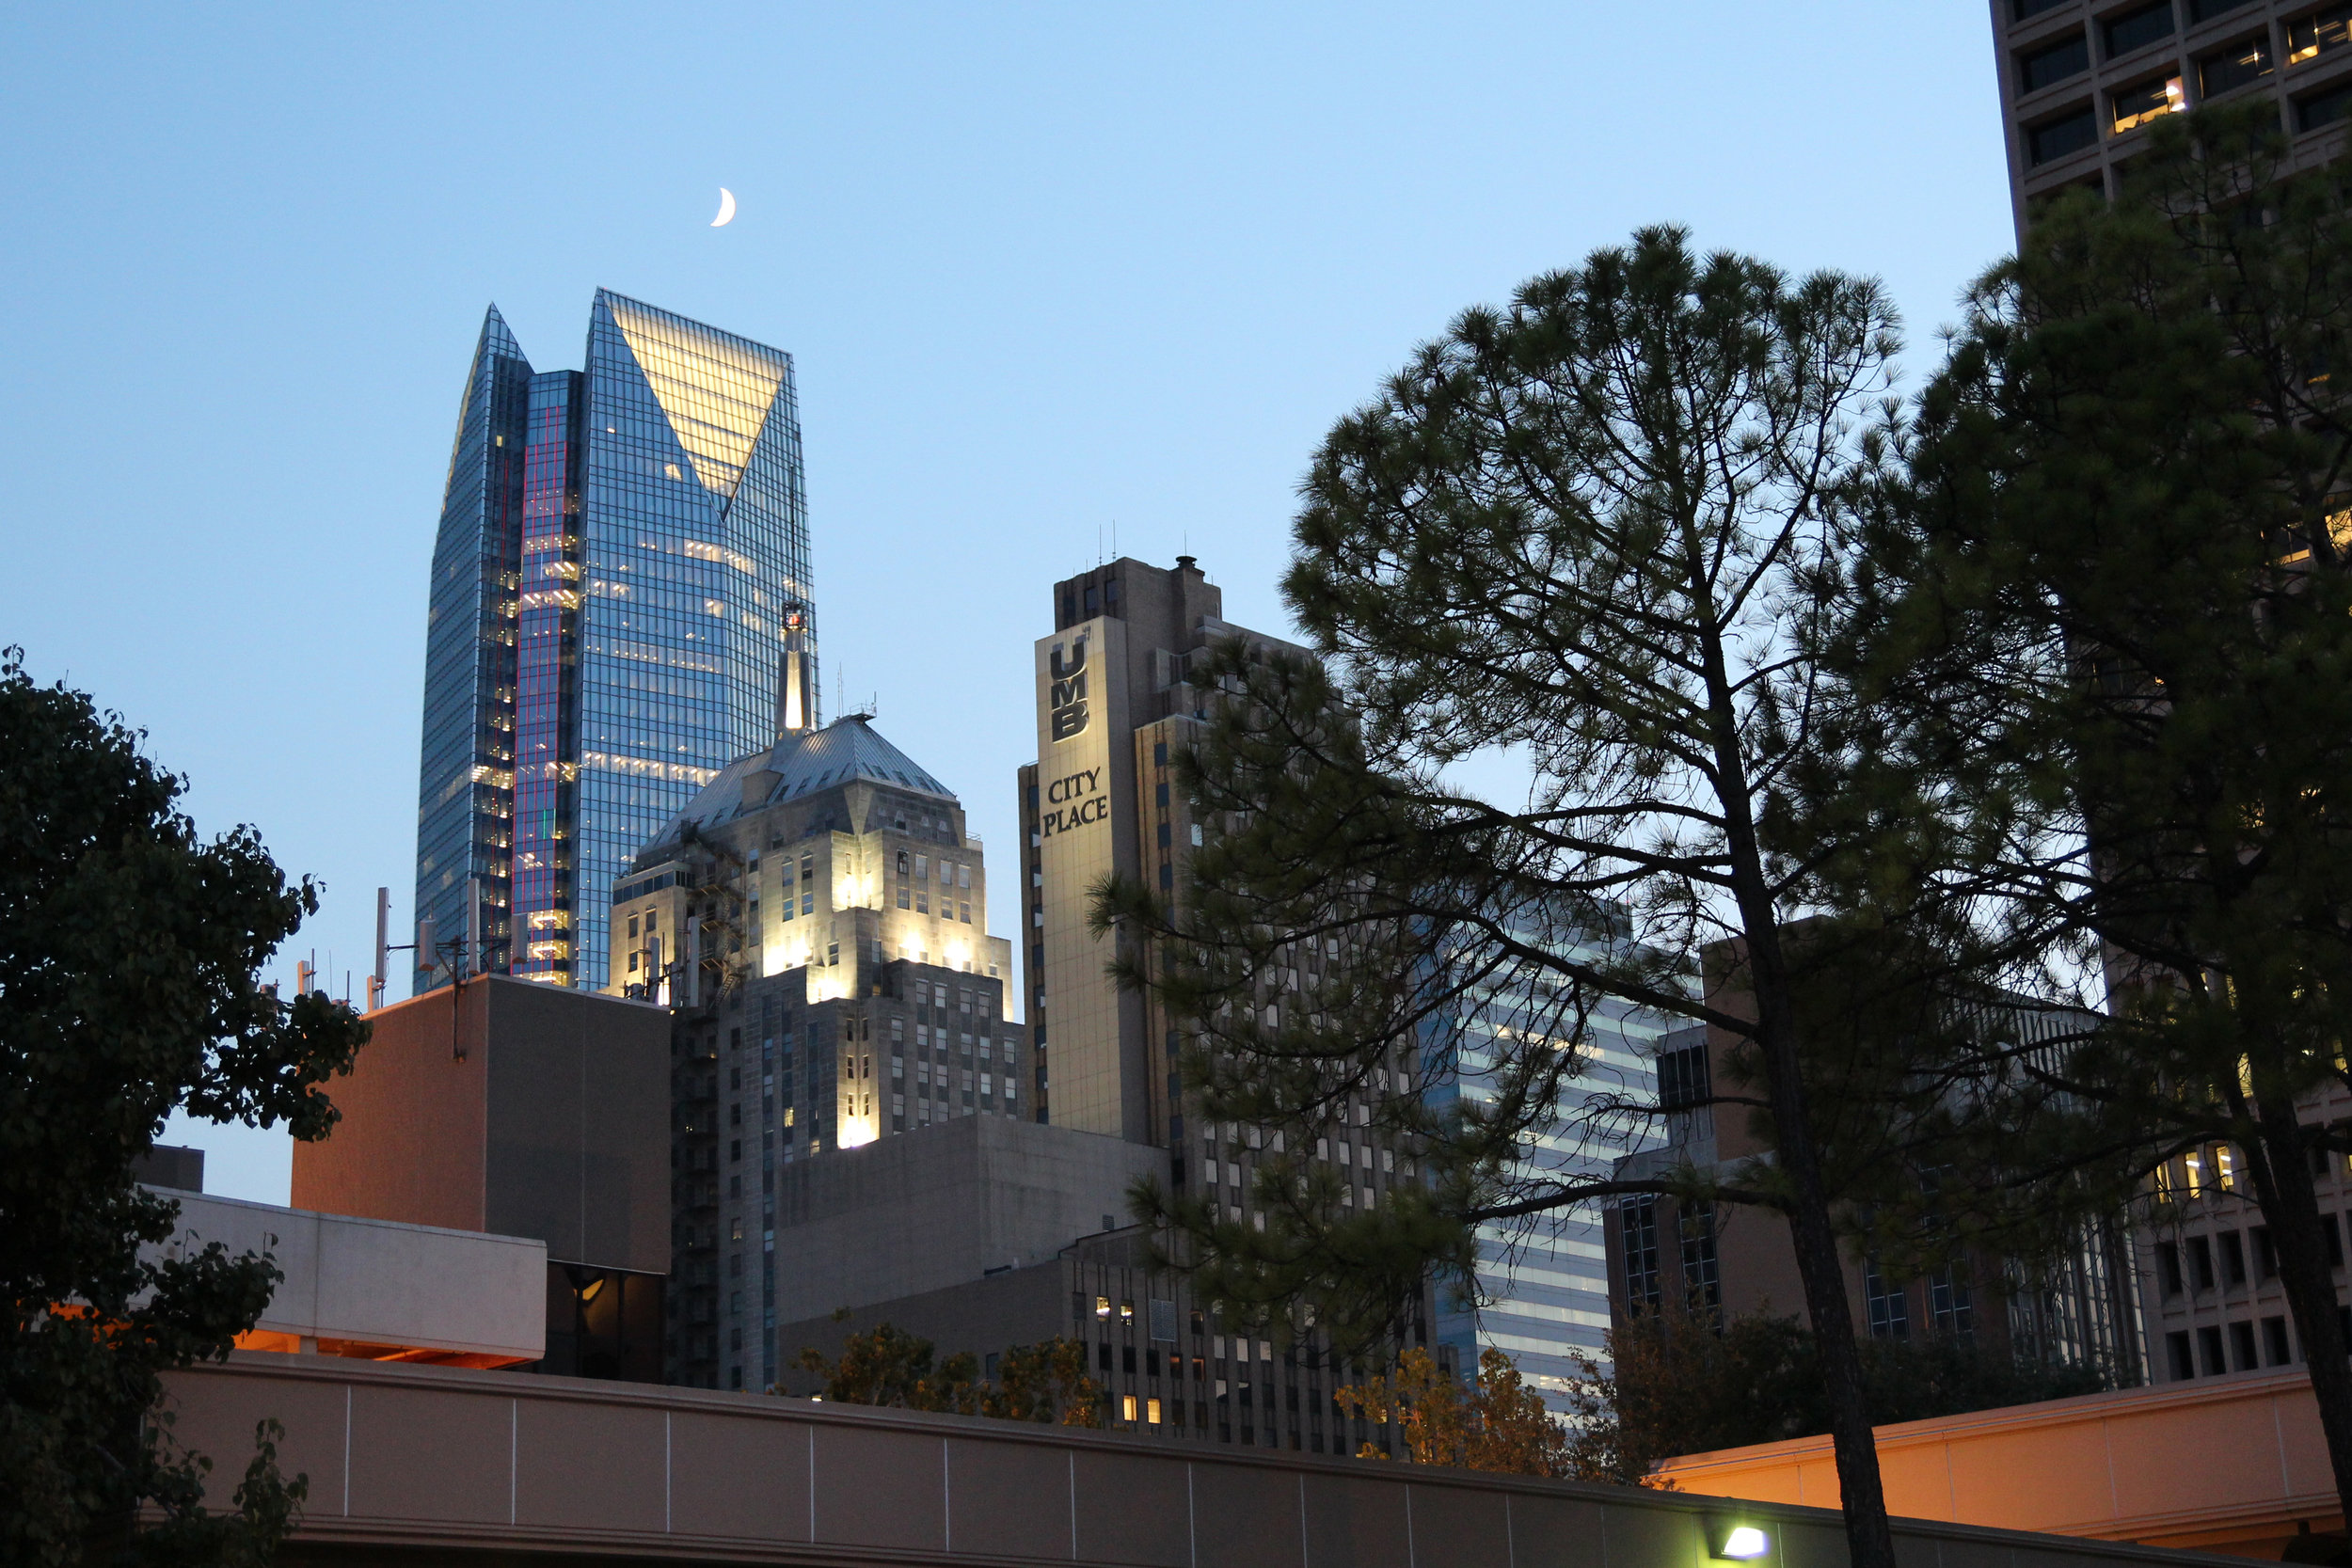 DowntownOKCwithMoon.jpg